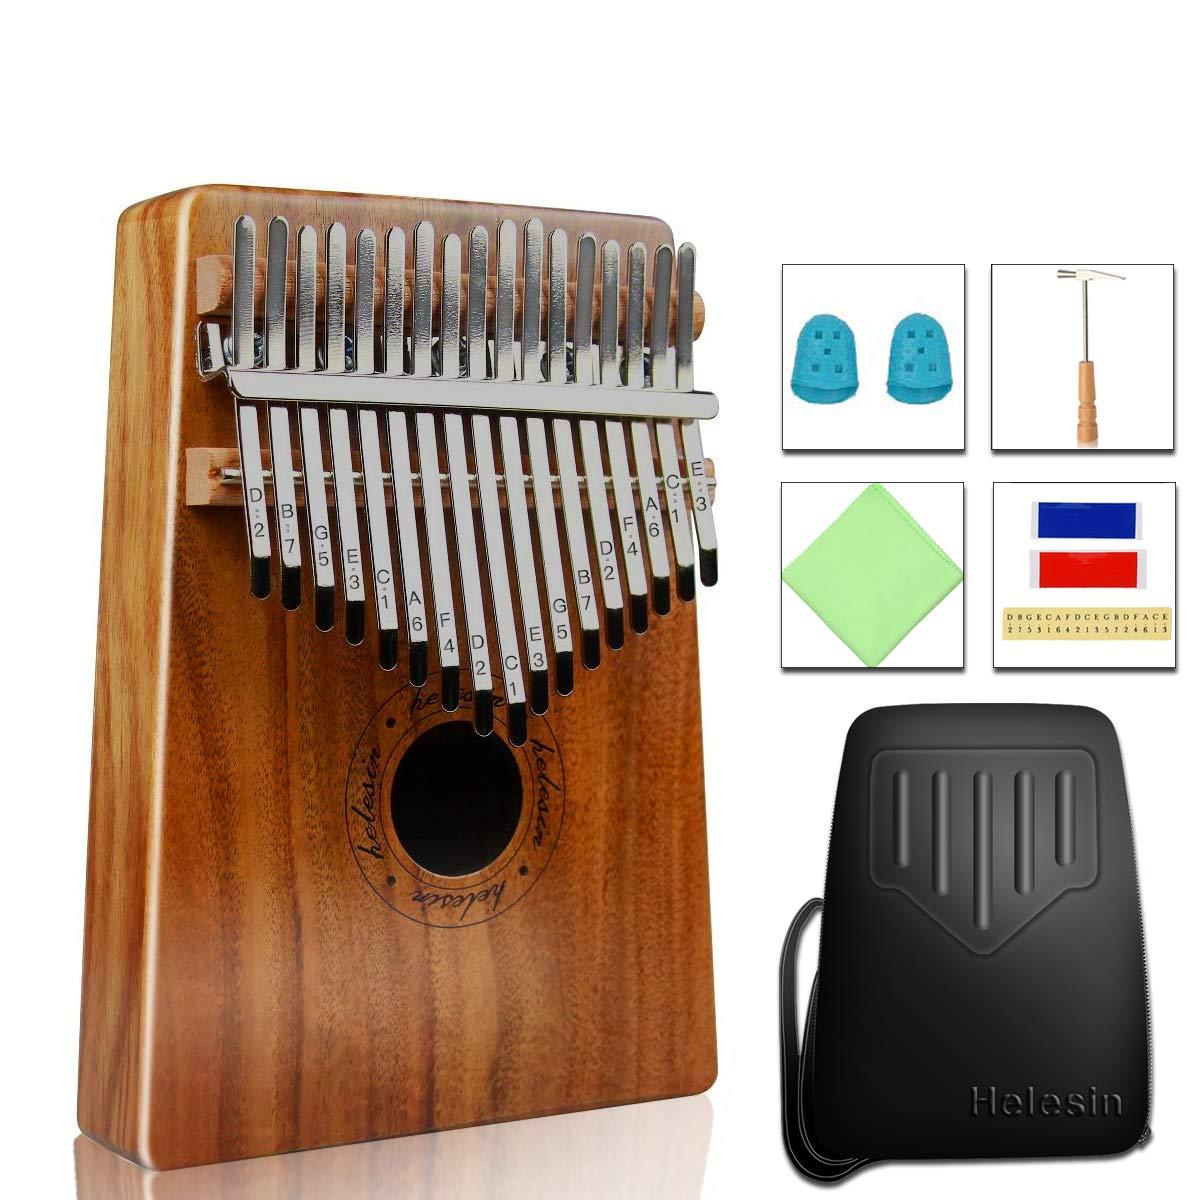 17 Keys Kalimba Thumb Piano, Professional KOA Mbira Protable Finger Piano with EVA Waterproof Hard Protective Case, Gift for Kids Adult Beginners